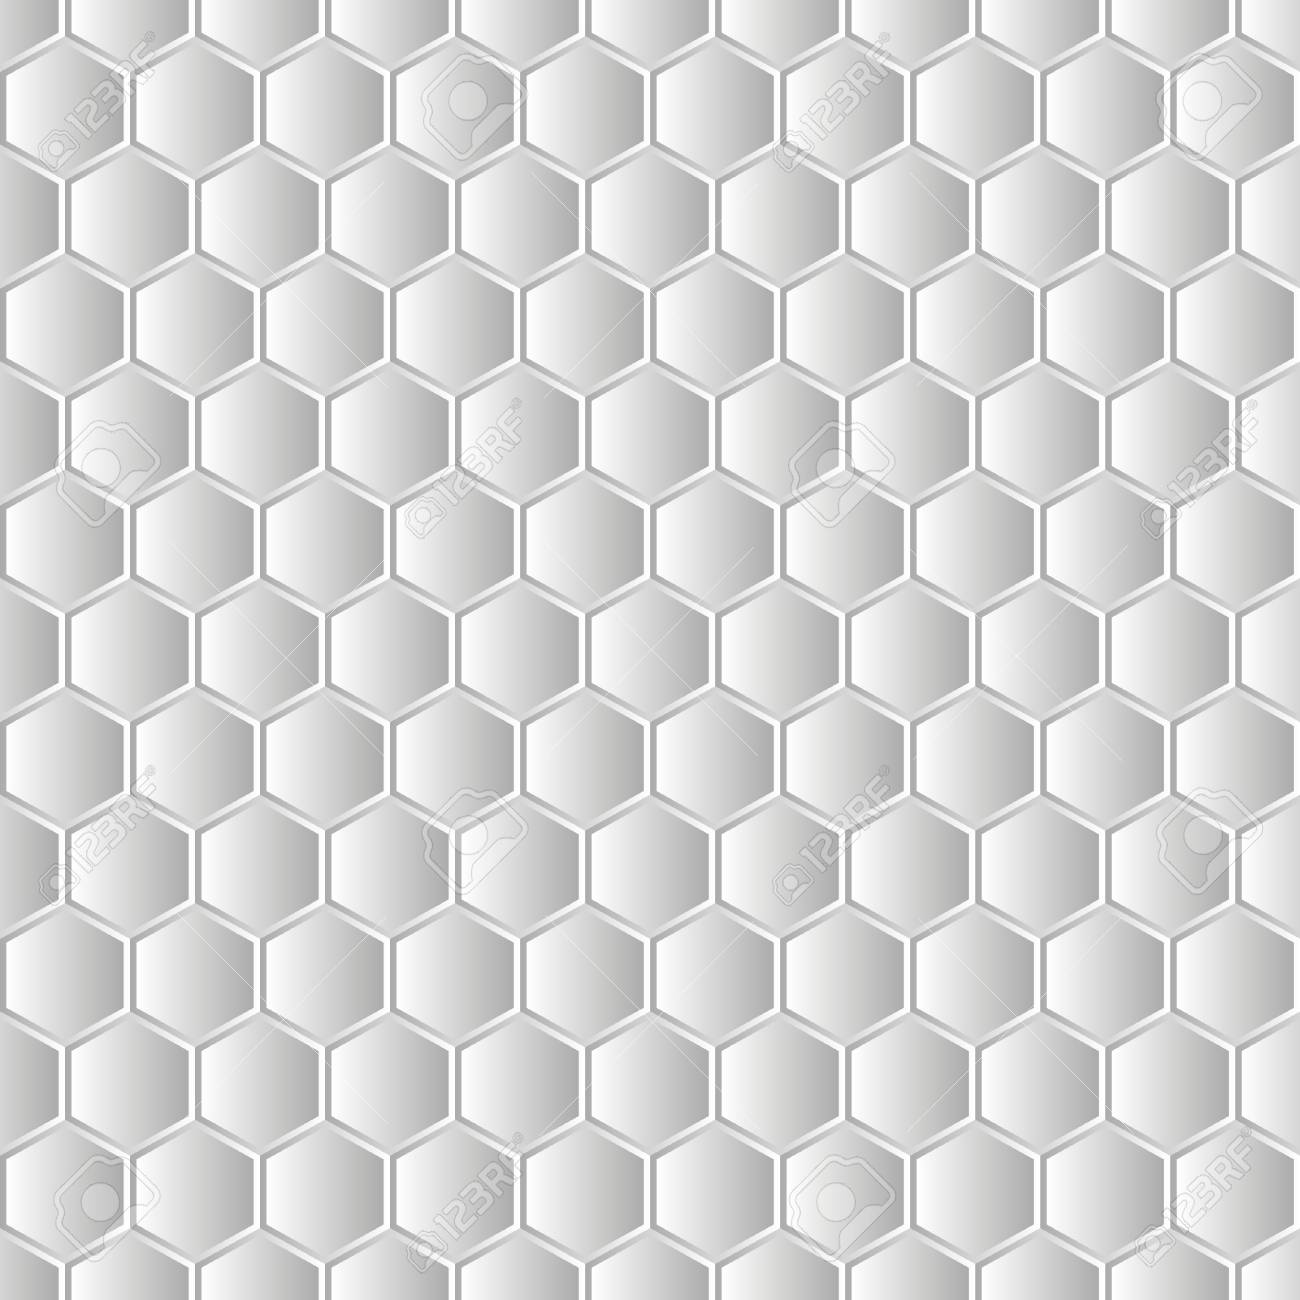 Fondo Blanco Moderno. Textura 3D Sin Fisuras. Patrón De Hexágono ...